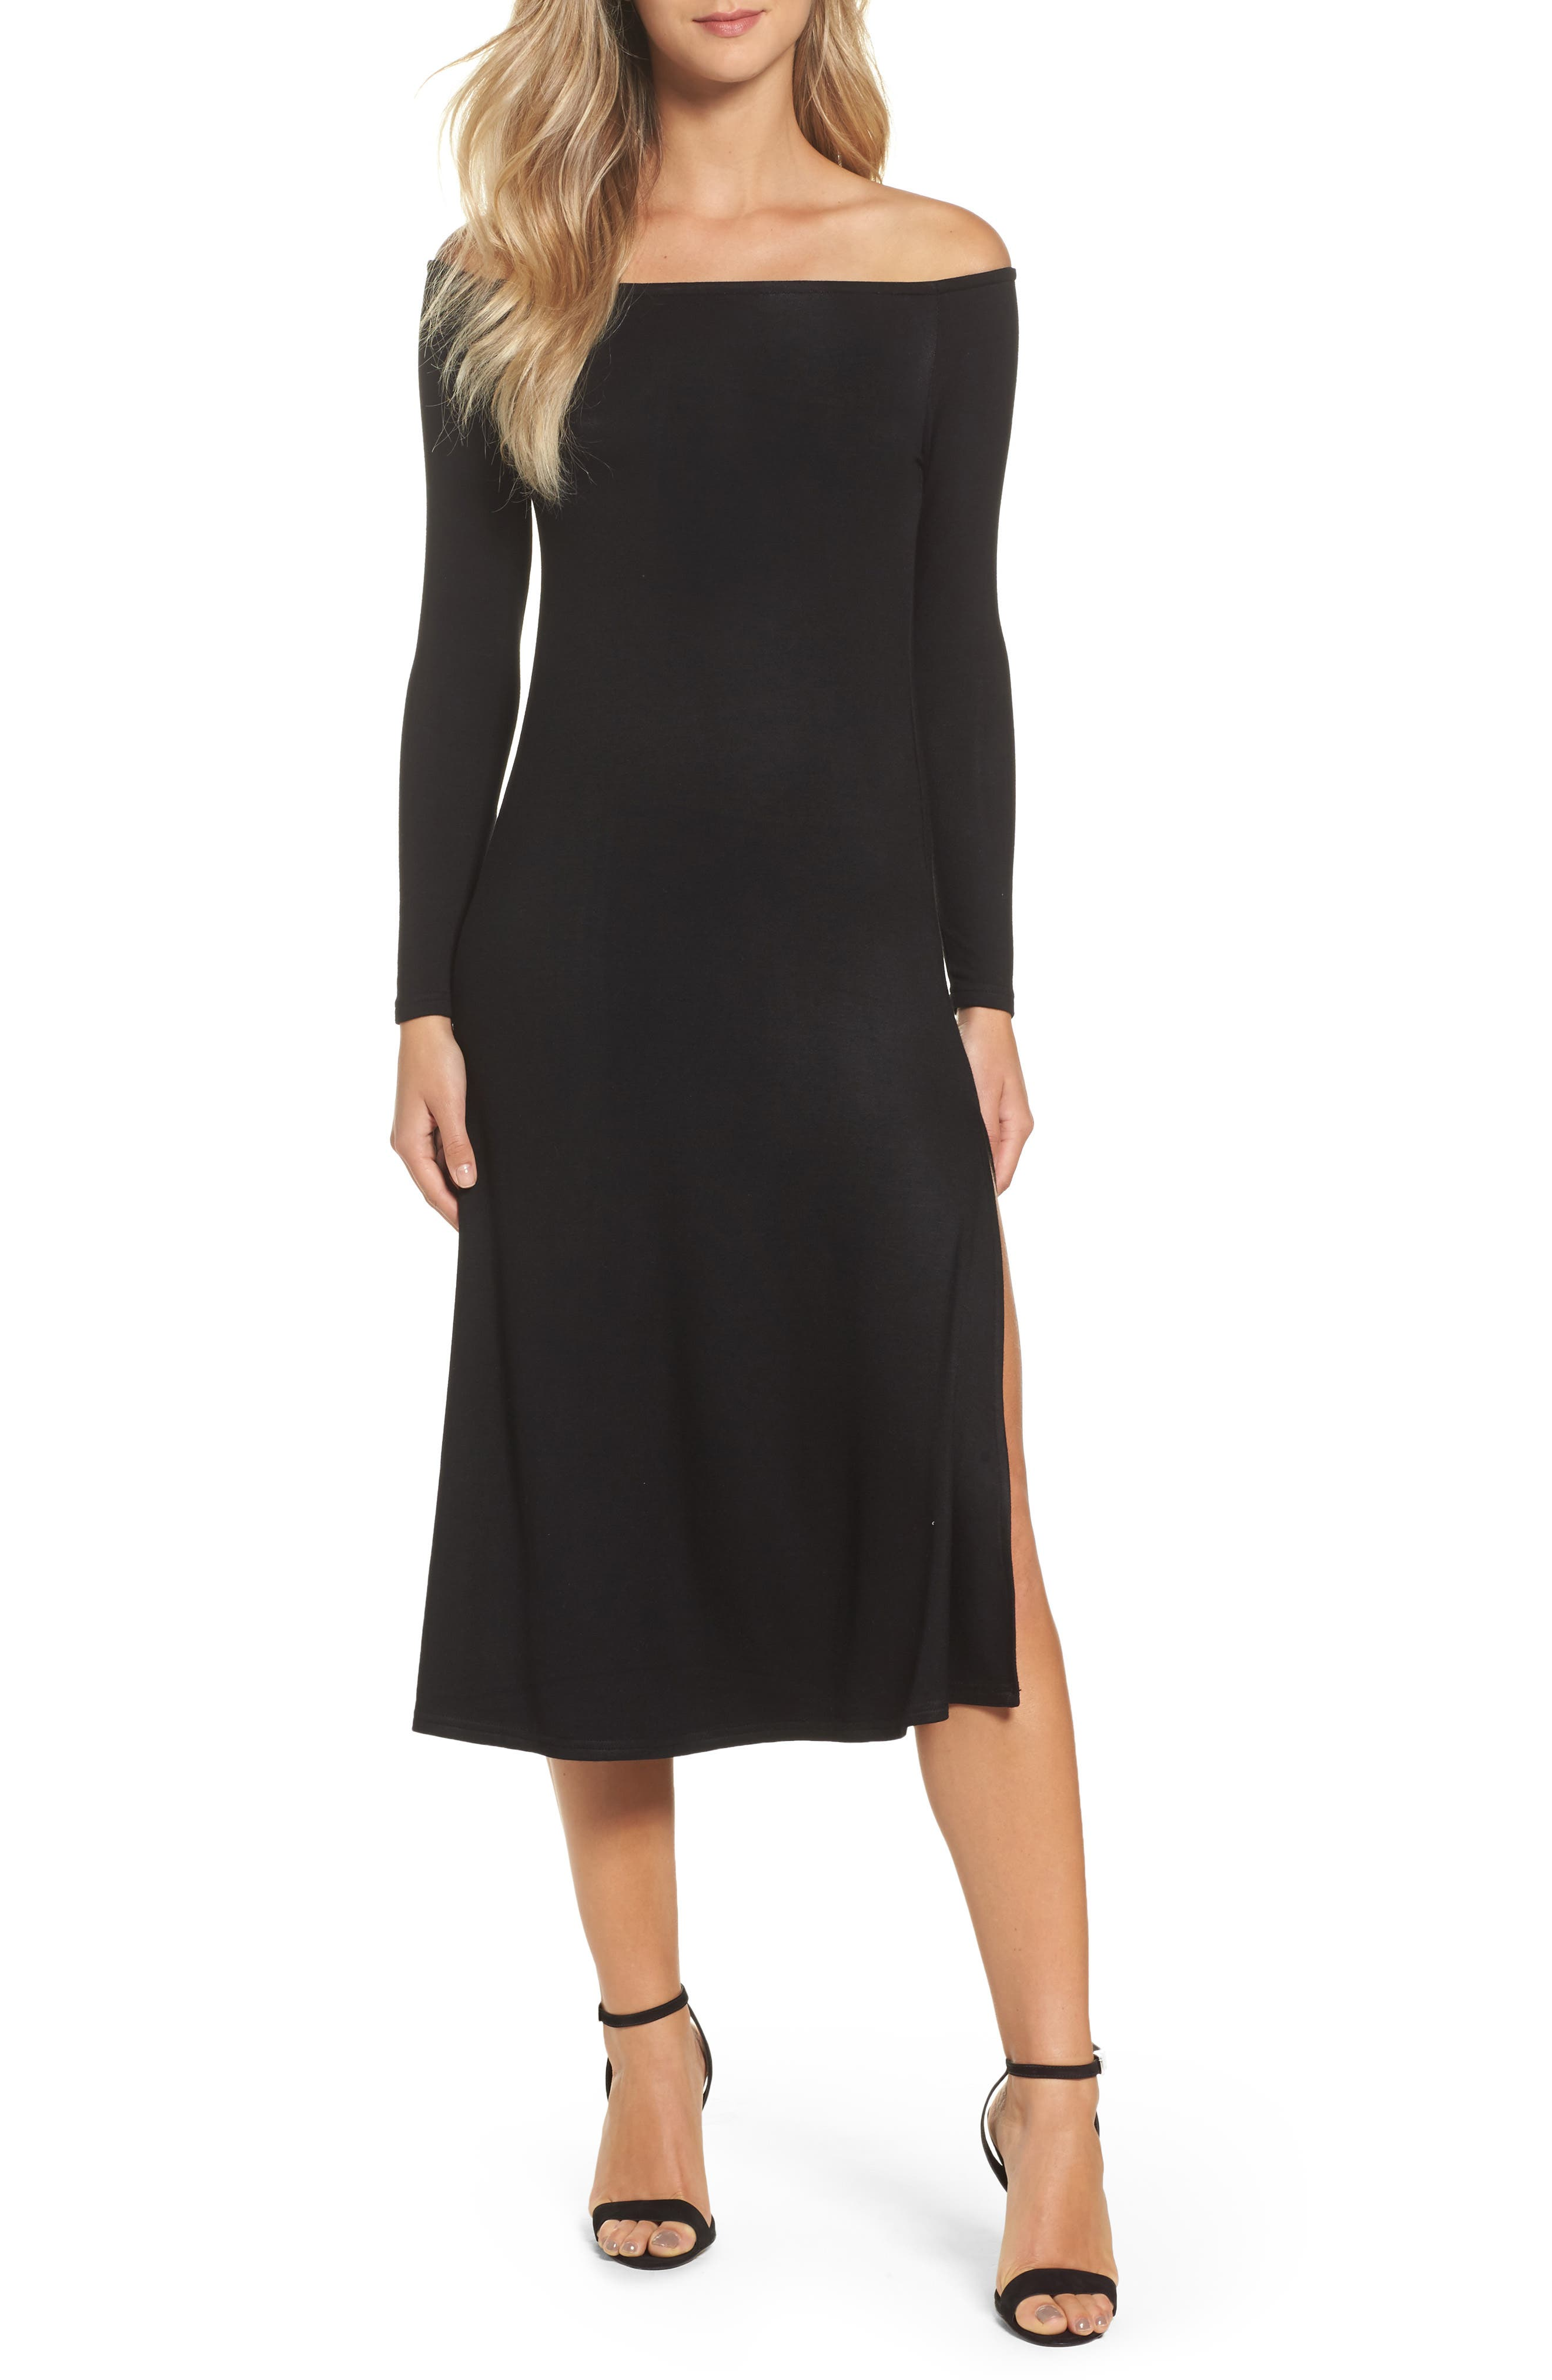 Alternate Image 1 Selected - BB Dakota Blair Off the Shoulder A-Line Dress